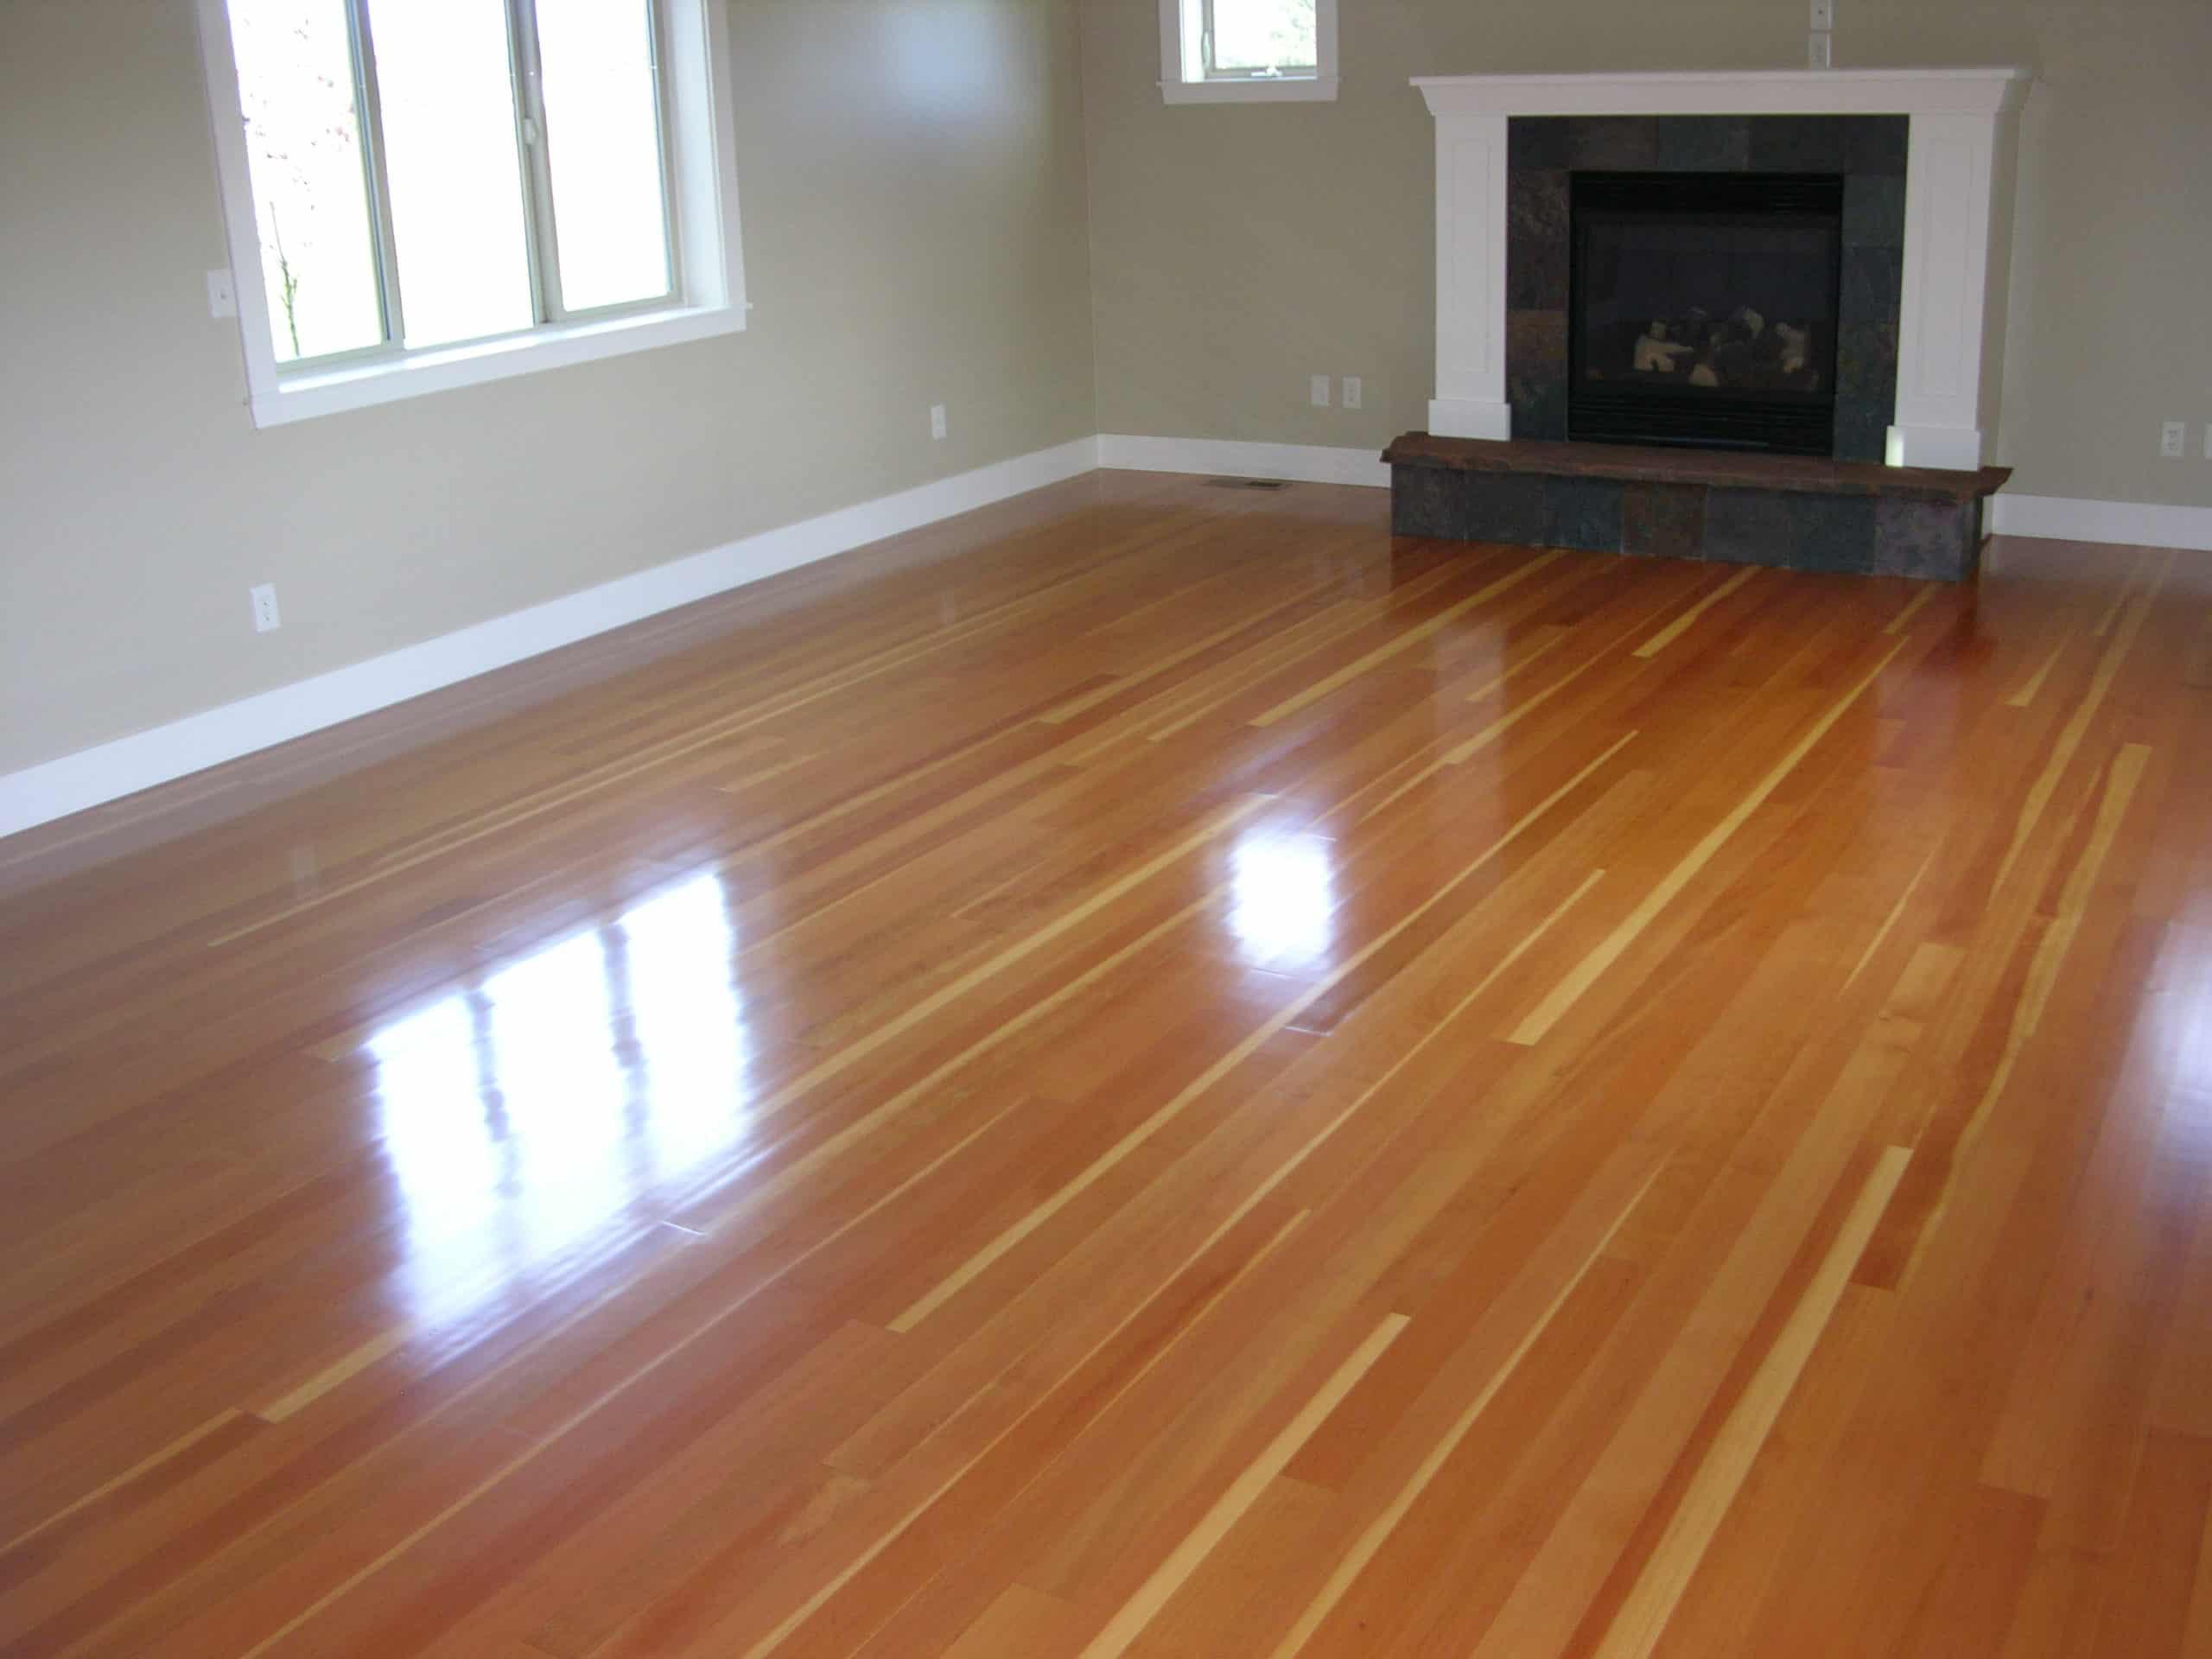 Custom Hardwood Flooring Installation And Refinishing